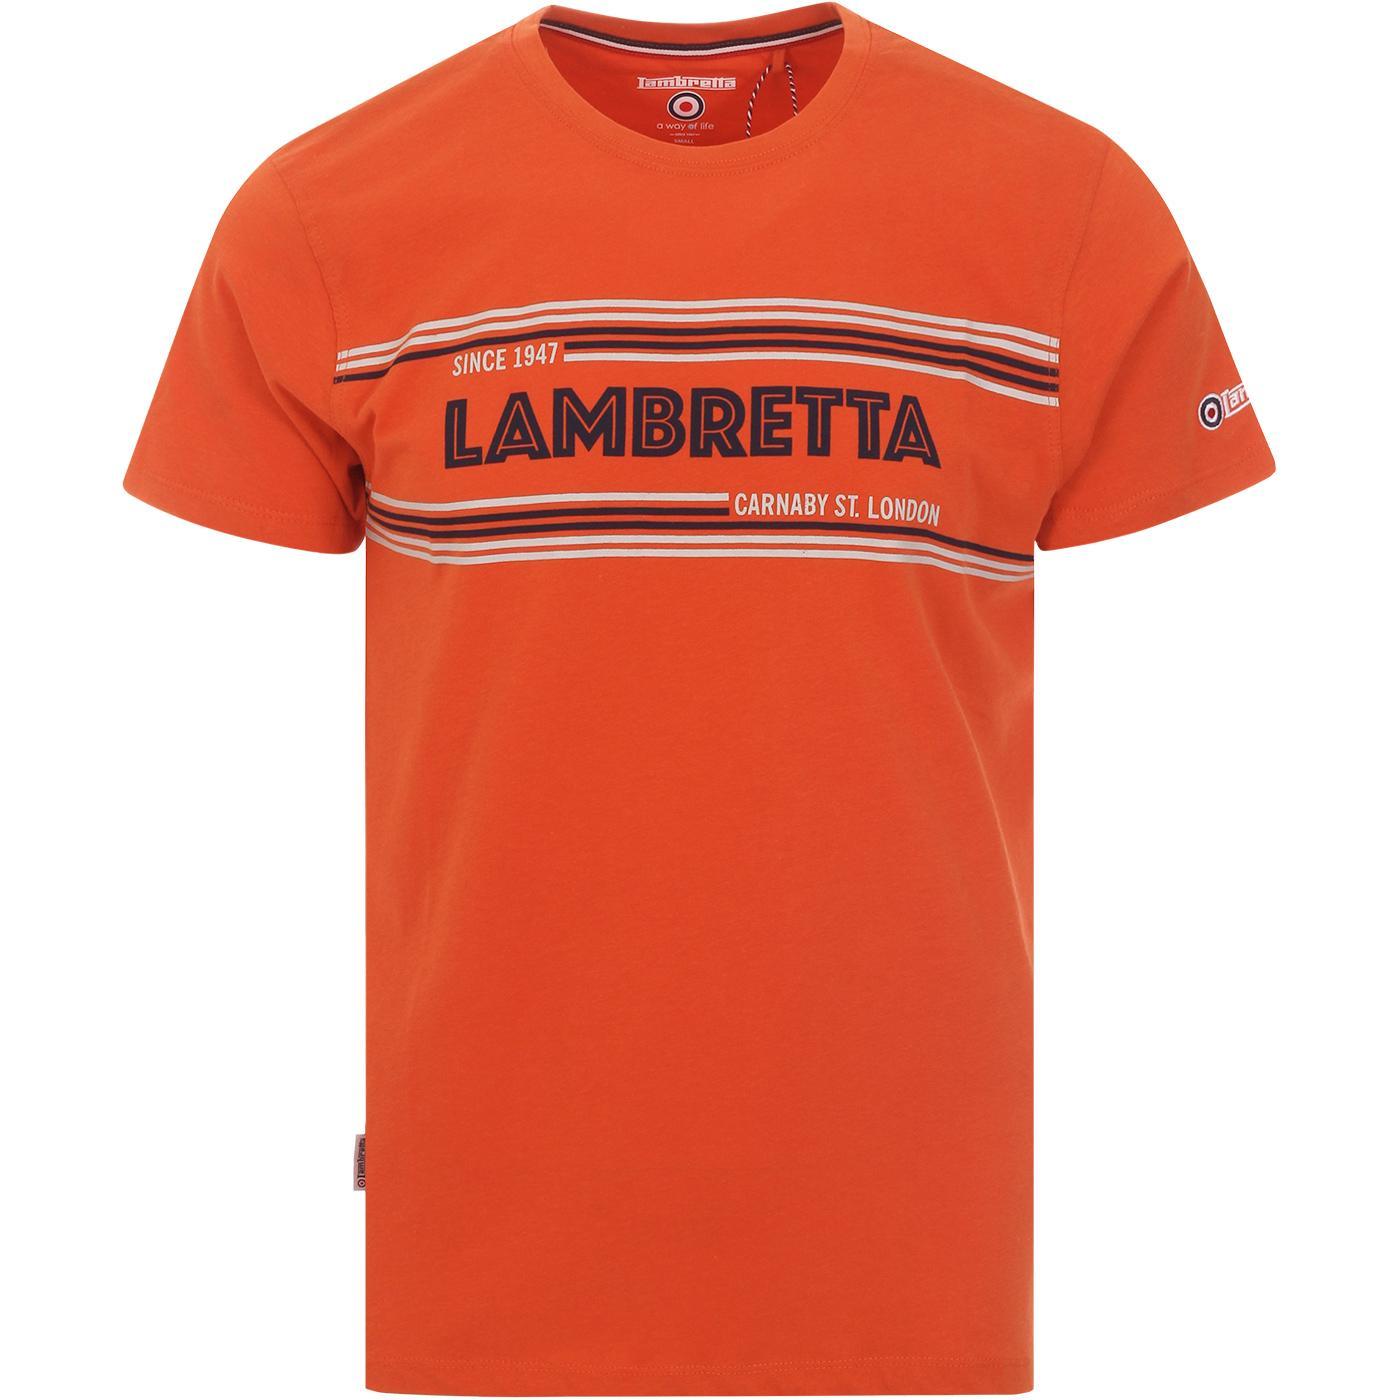 LAMBRETTA Retro Carnaby Chest Logo Tee In Orange